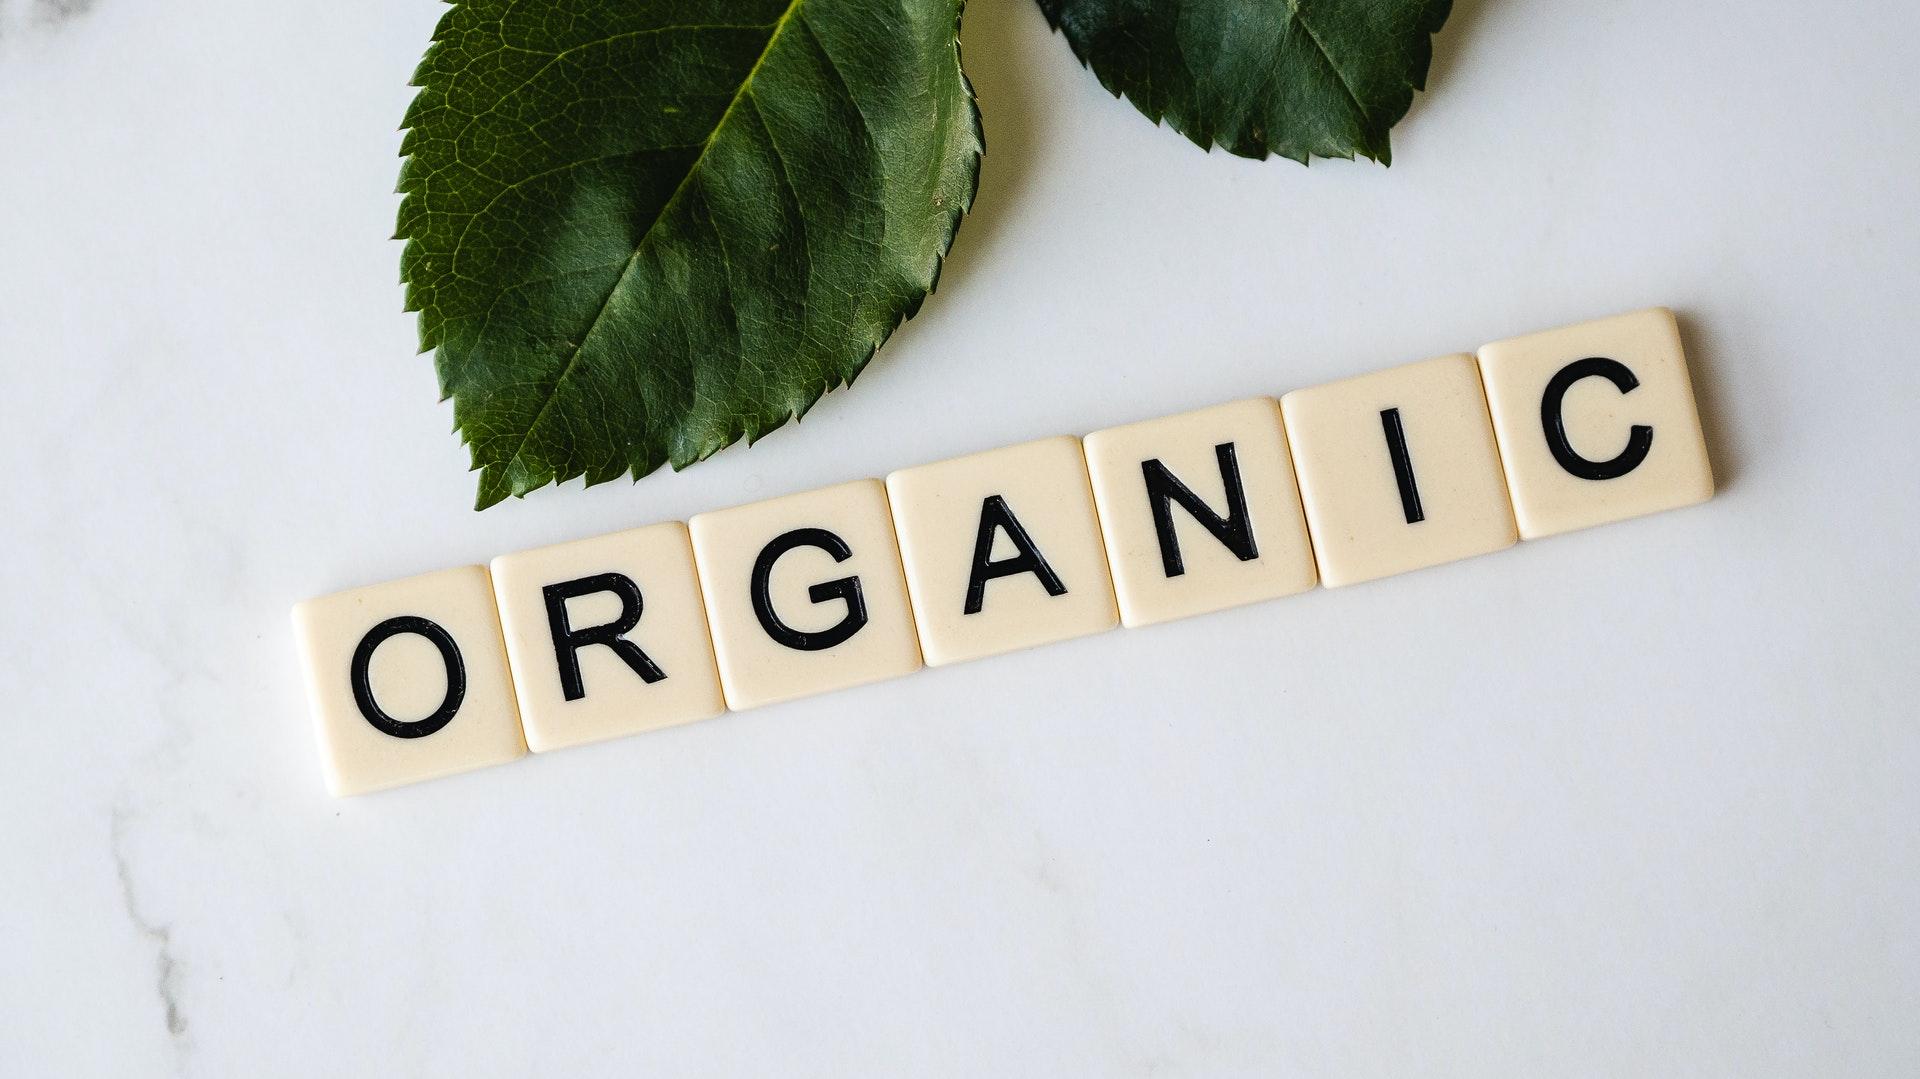 3 Reasons Why You Should Shop Organic